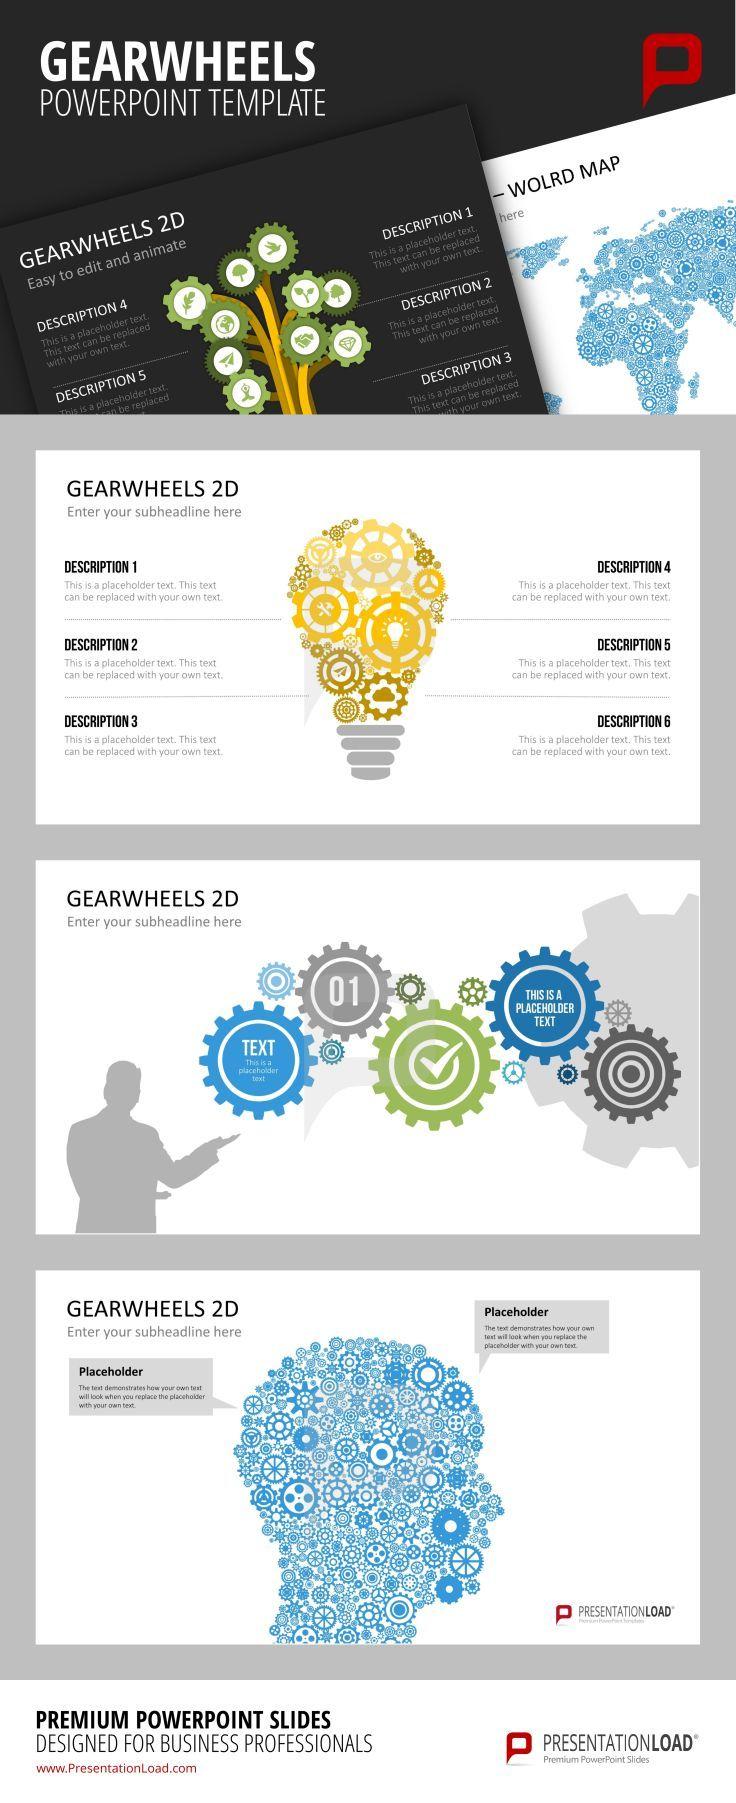 47 best technical design powerpoint templates images on pinterest gearwheels powerpoint templates templatesrole modelstemplate toneelgroepblik Gallery